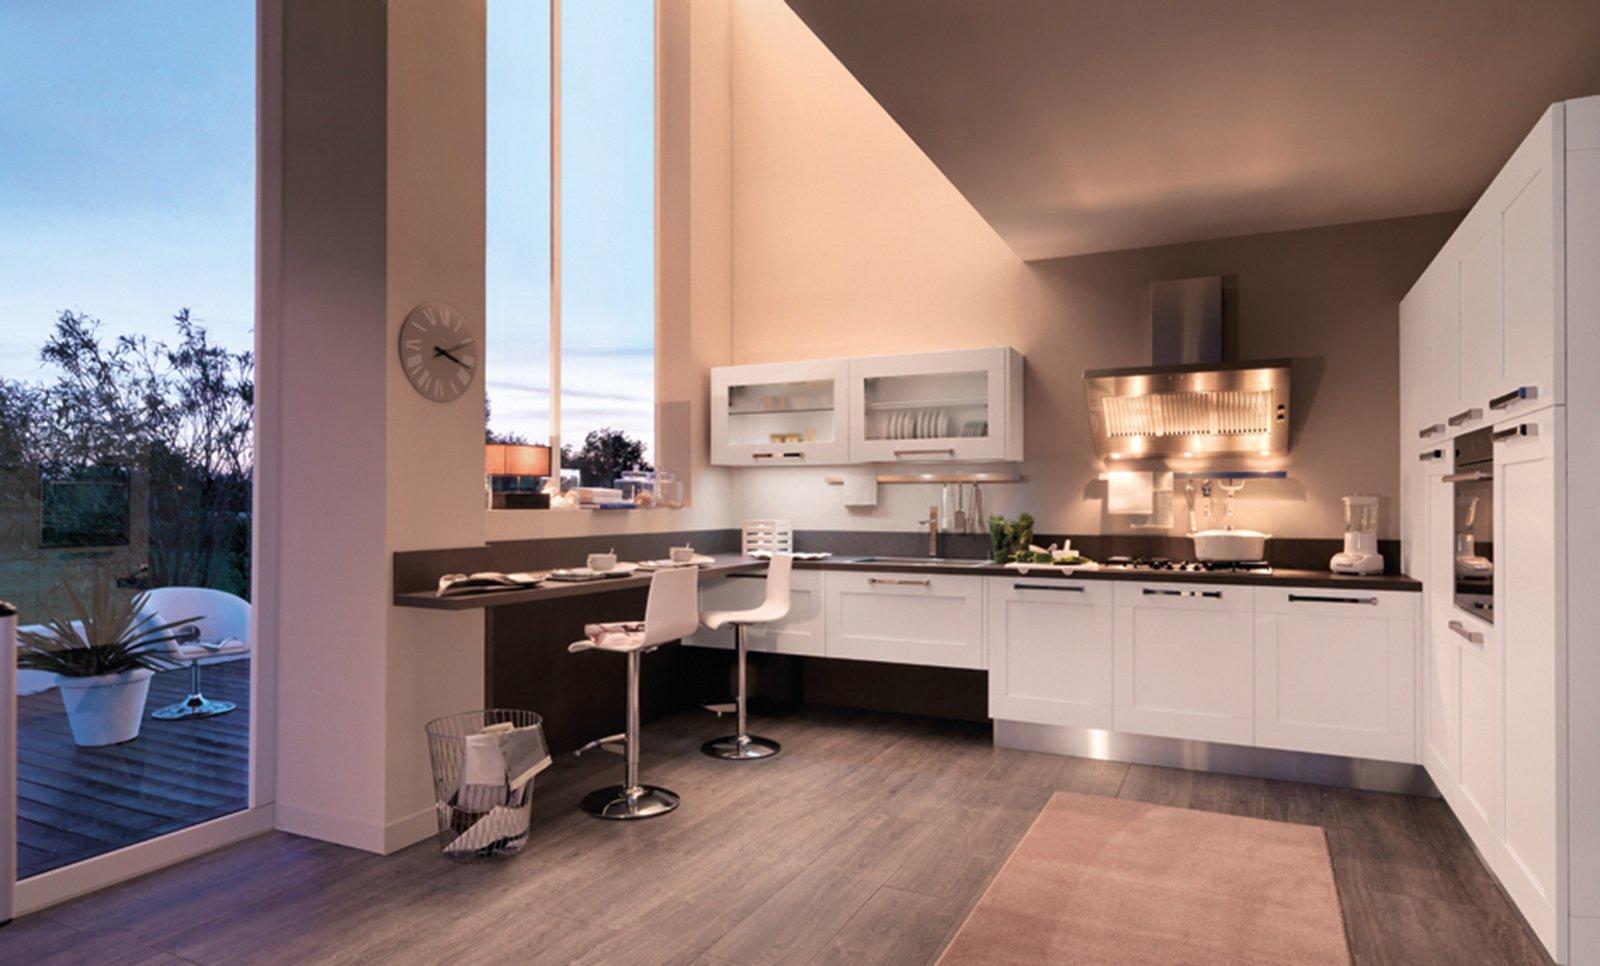 Cucina tante soluzioni per illuminarla cose di casa - Illuminazione cucina moderna ...